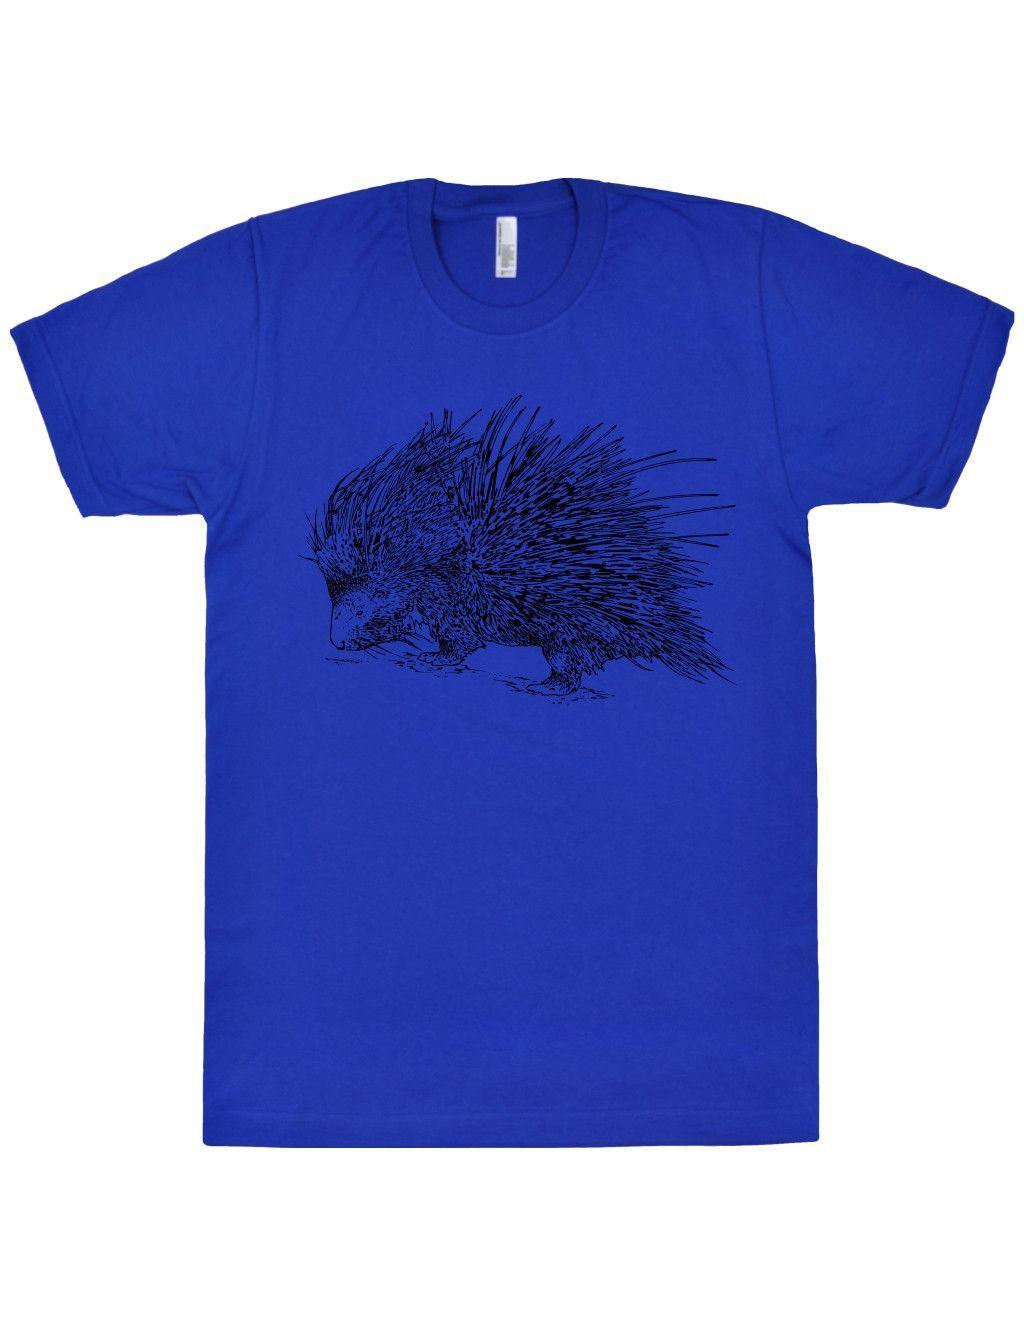 Porcupine T-Shirt. Men / Unisex Fine Jersey Short Sleeve Tee. Black Print